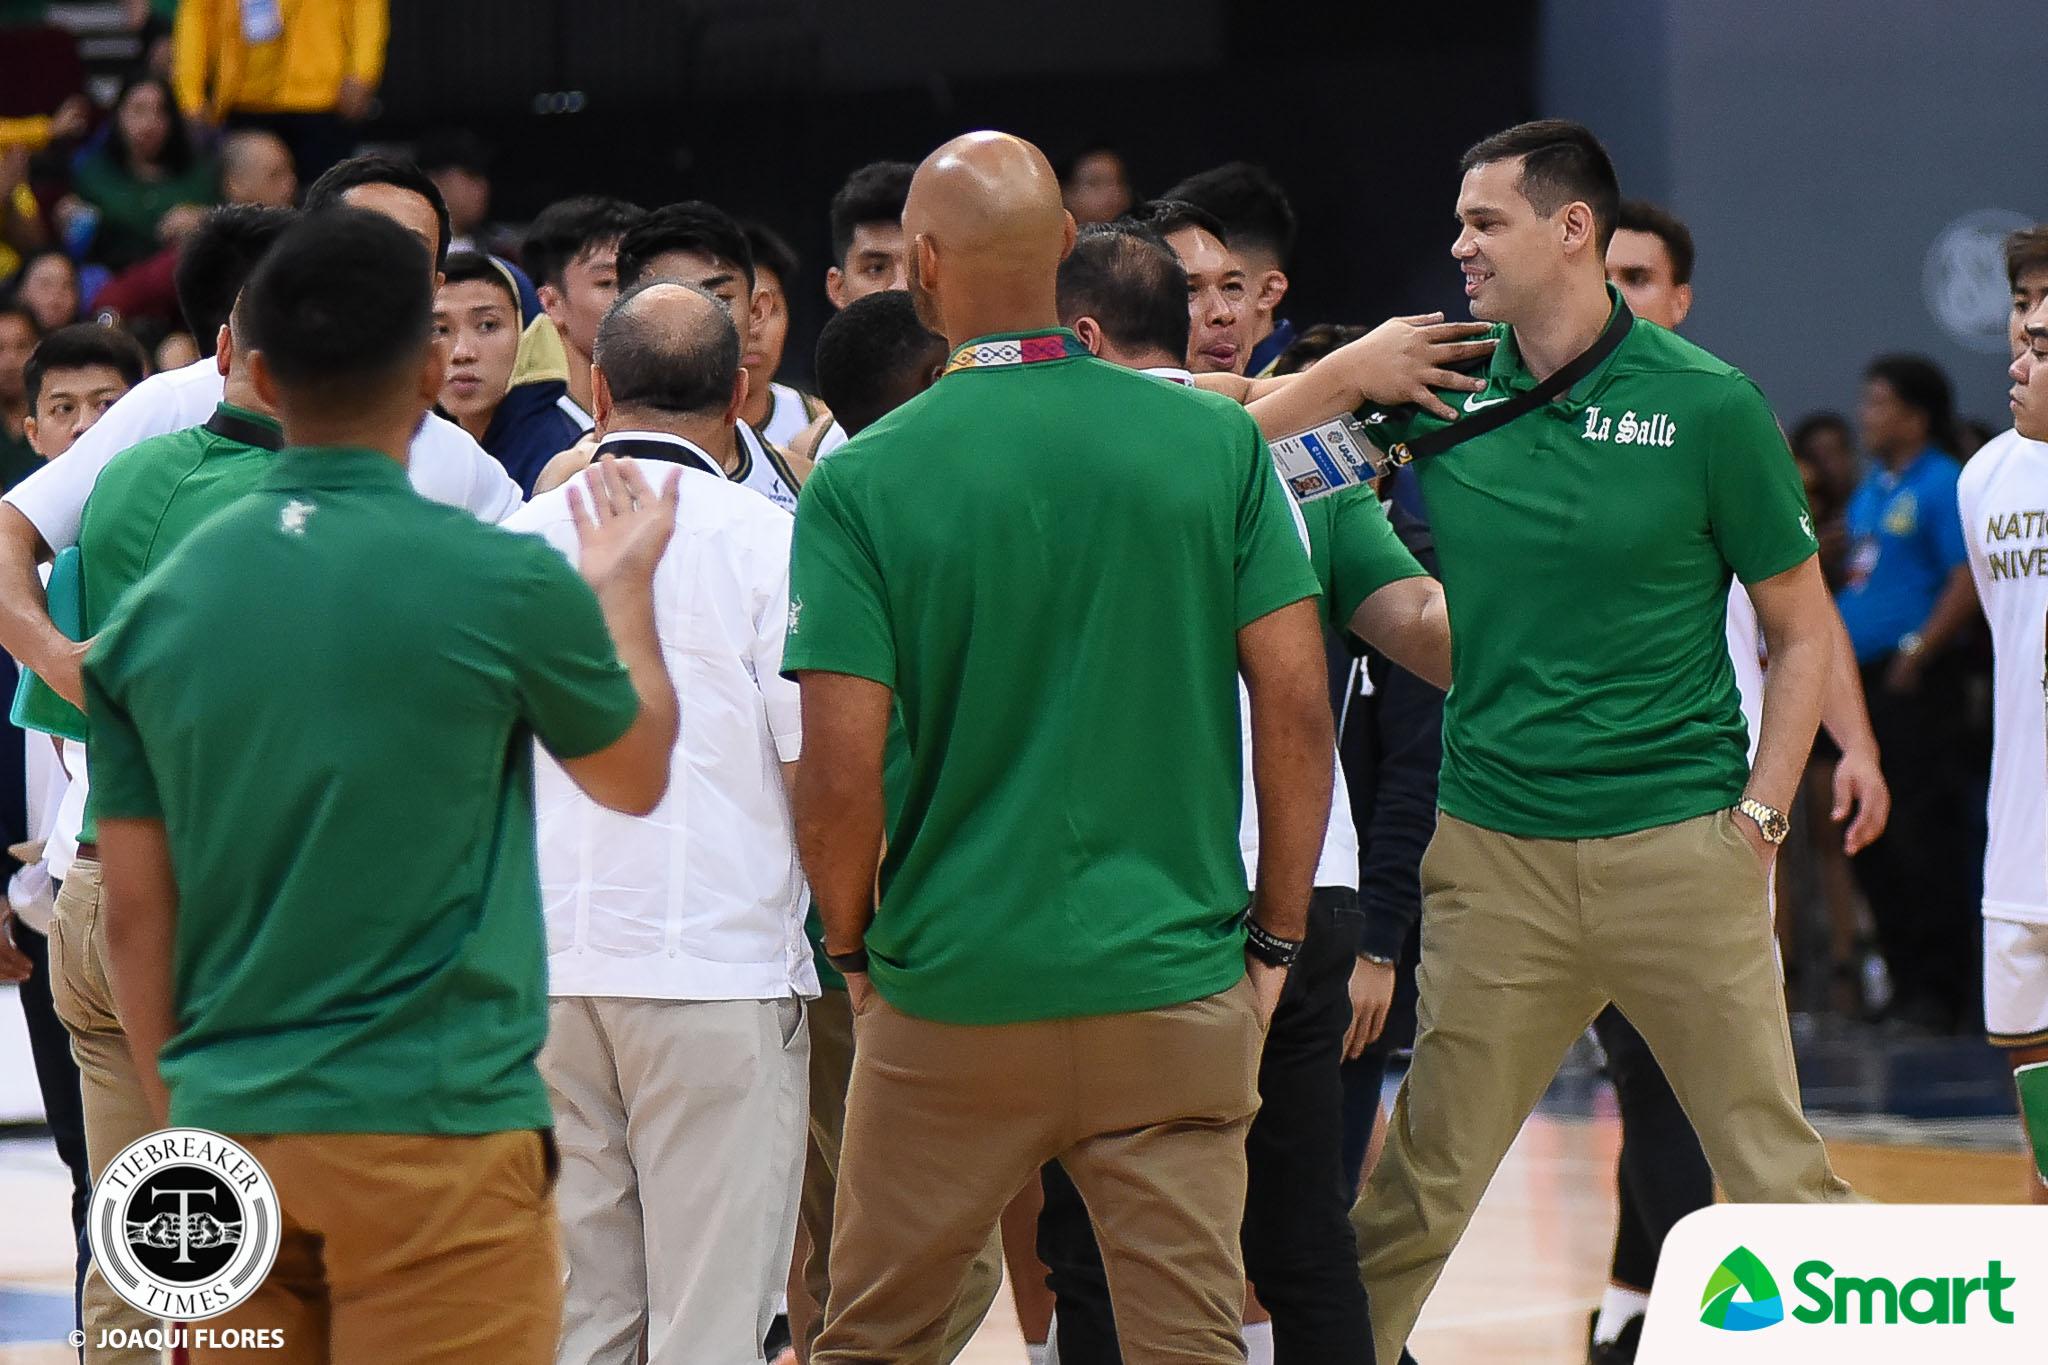 Tiebreaker Times Jarin, Byrd figure in post-game confrontation Basketball DLSU News UAAP  UAAP Season 82 Men's Basketball UAAP Season 82 Jermaine Byrd DLSU Men's Basketball